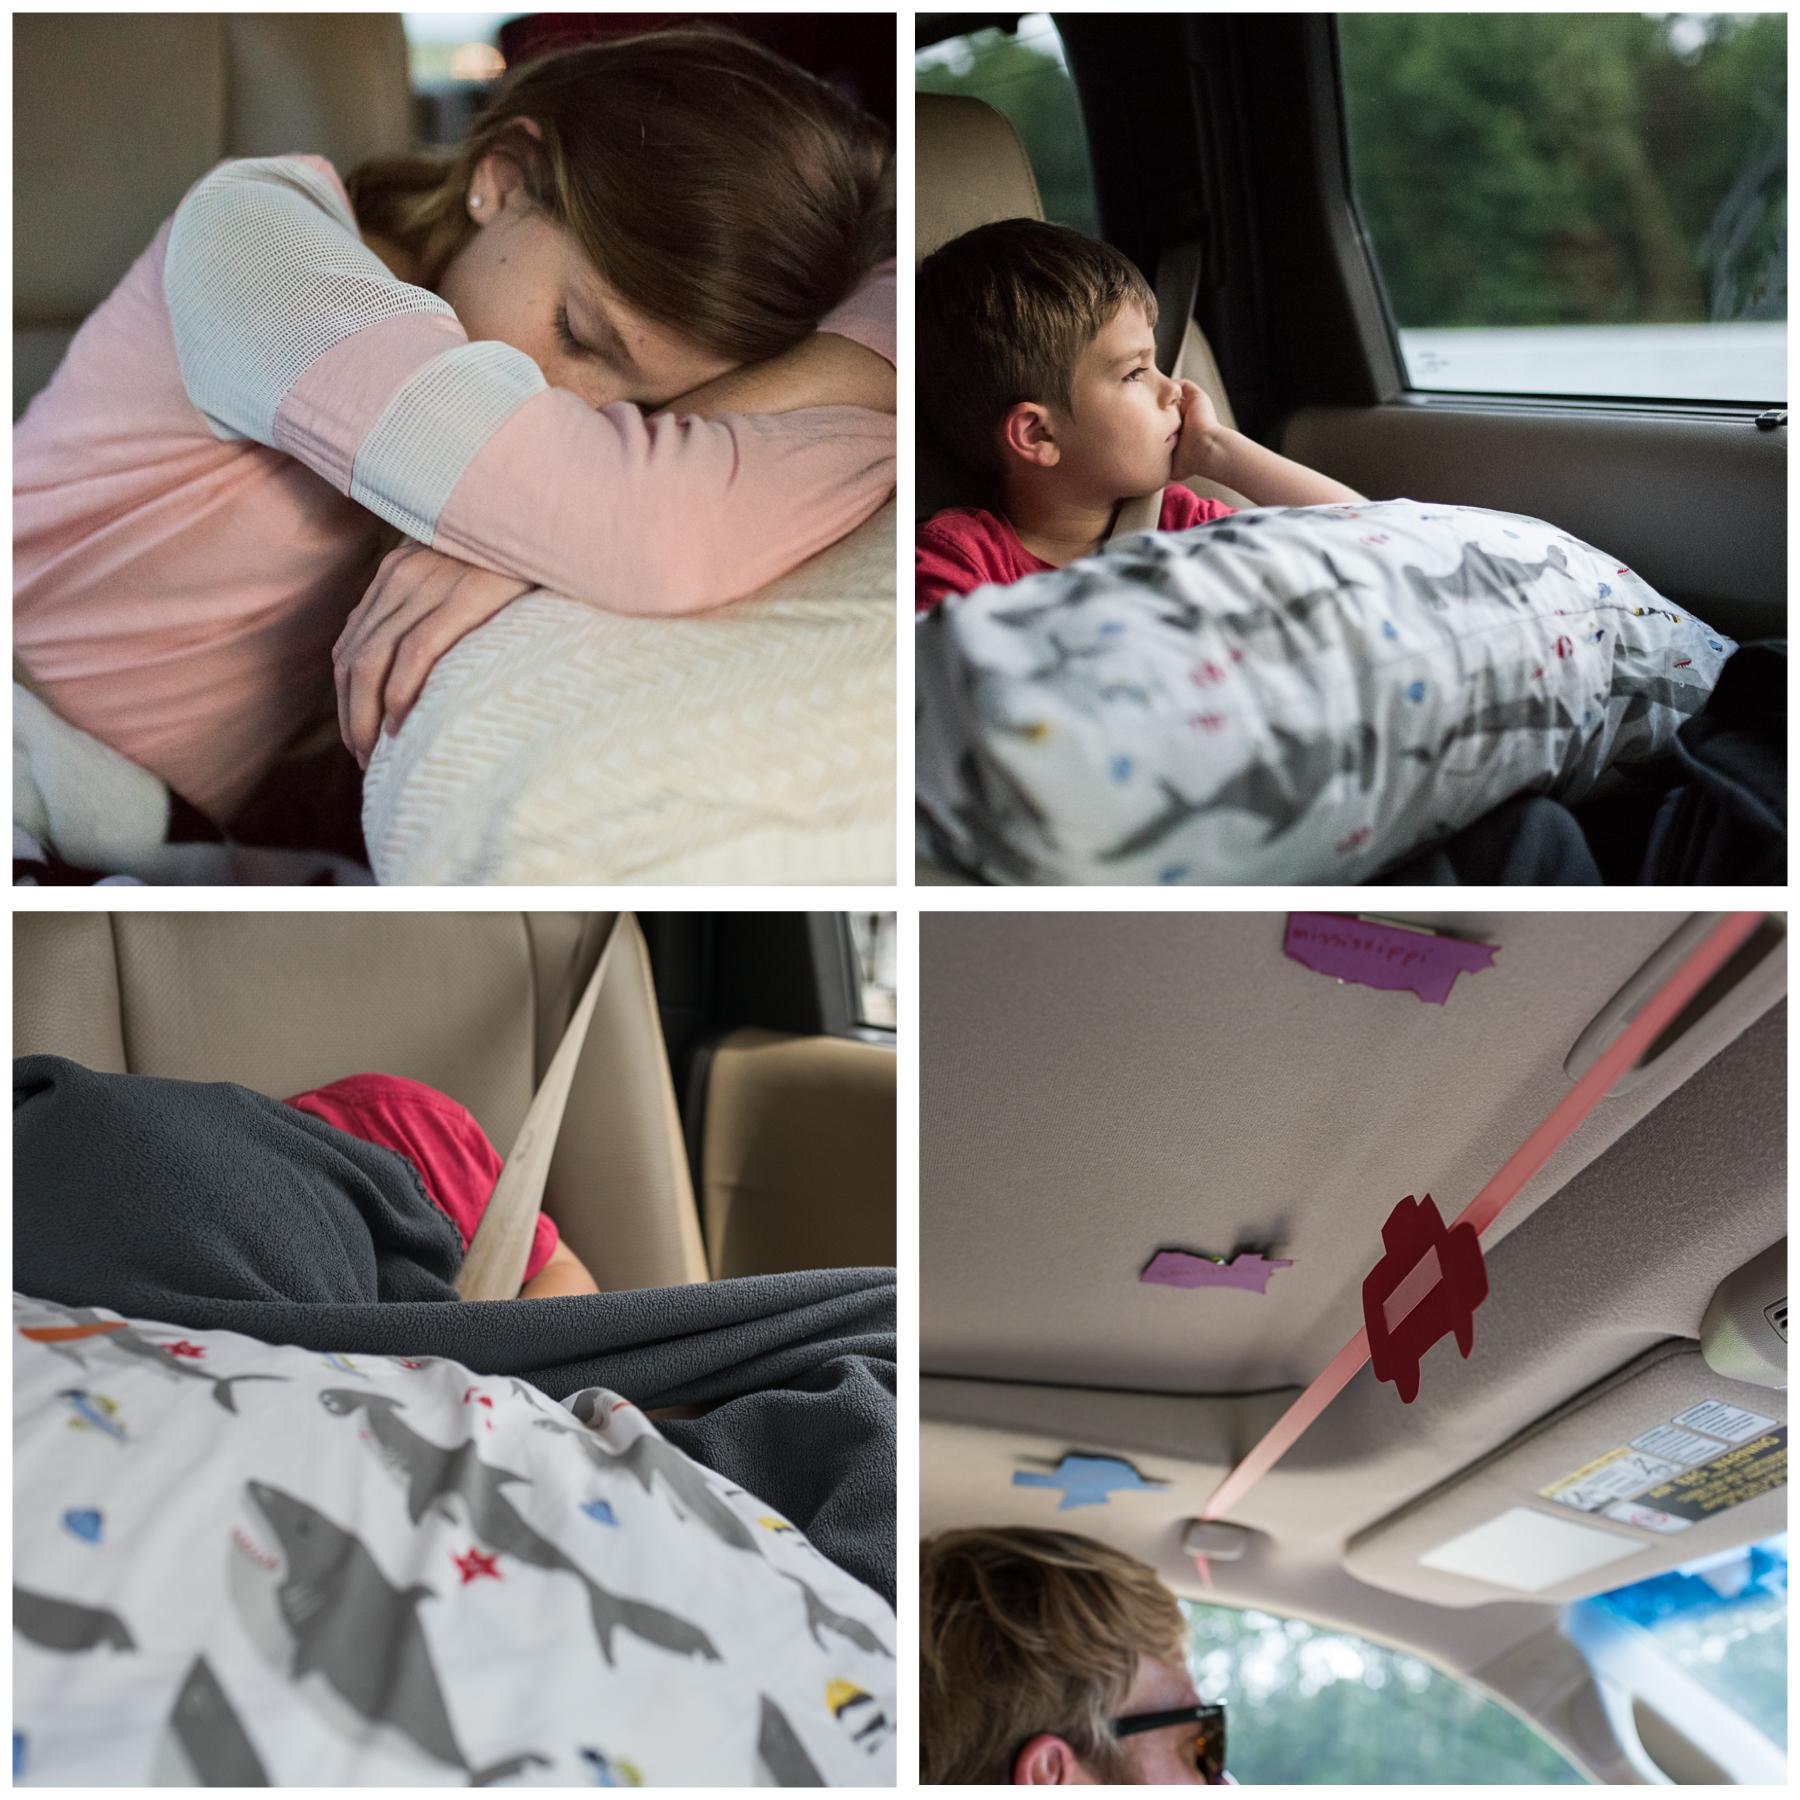 Ah, the good ol' fashioned family road trip.